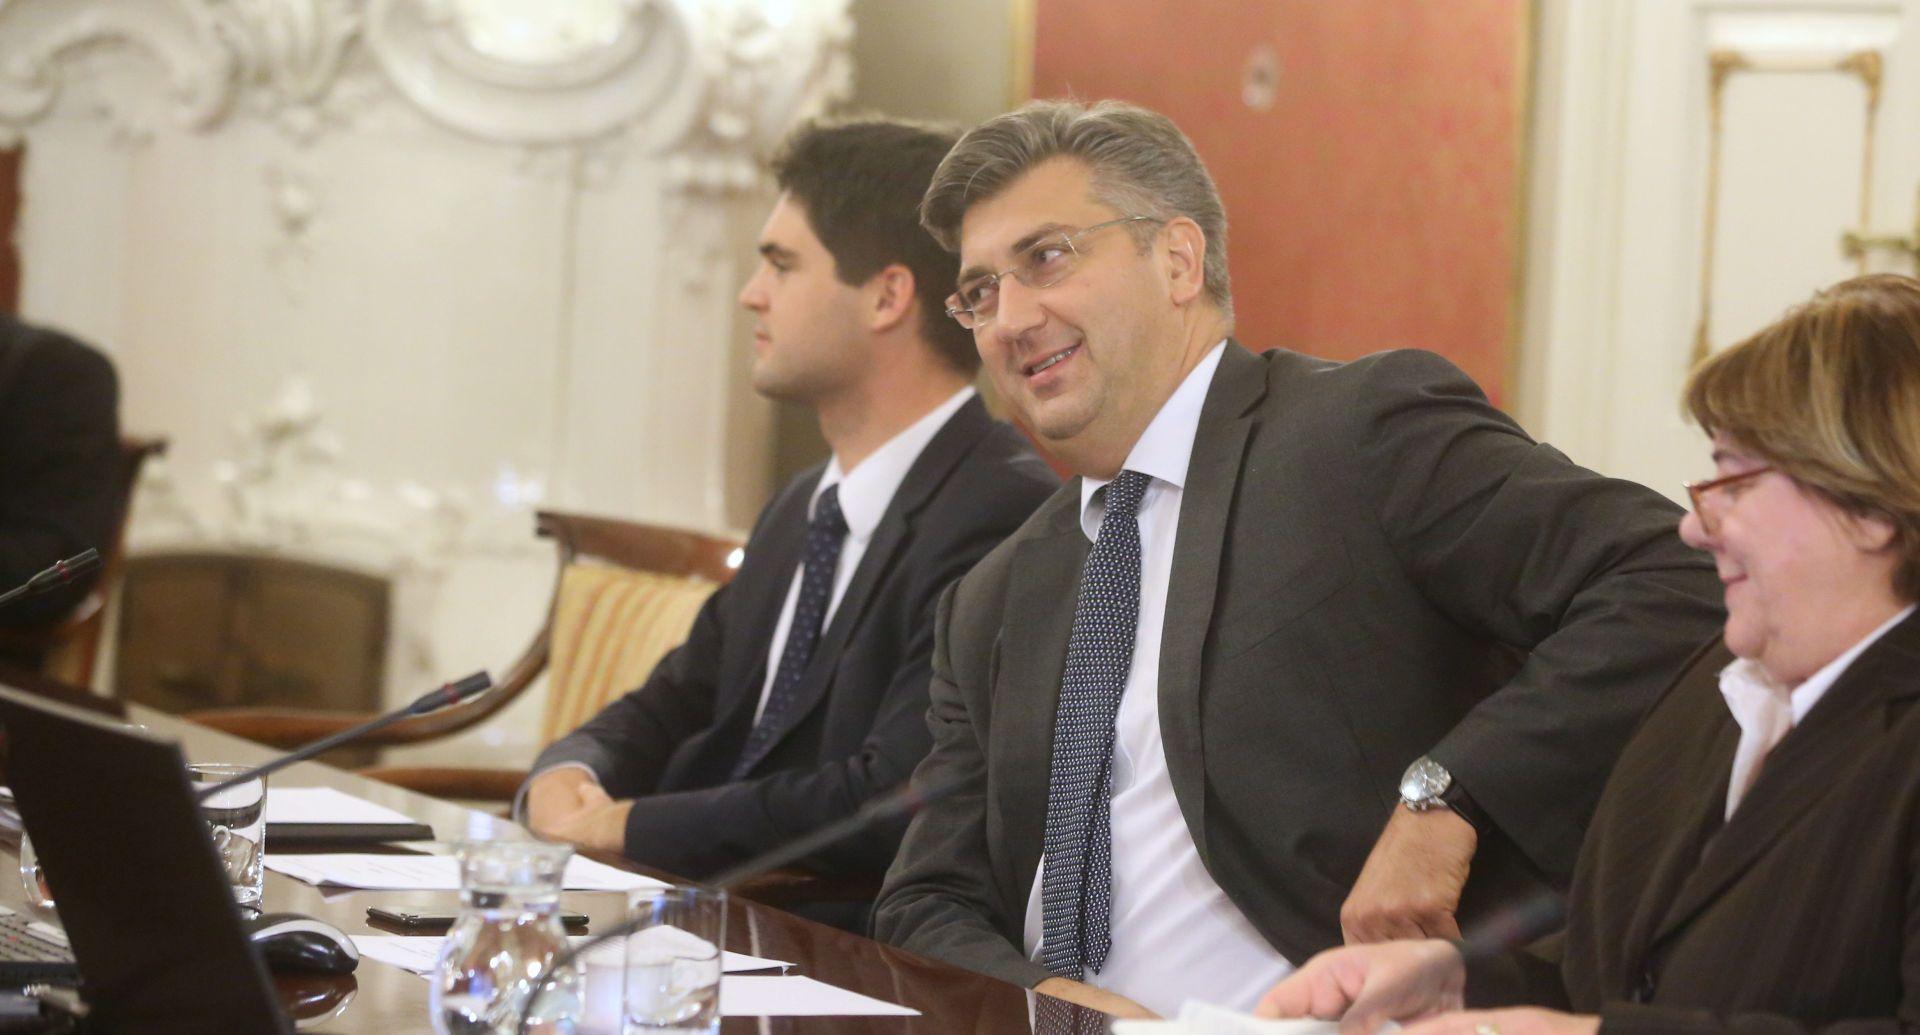 ISTRAŽIVANJE Plenković tone, Krstičević na vrhu a Dalić i Štromar na dnu popularnosti